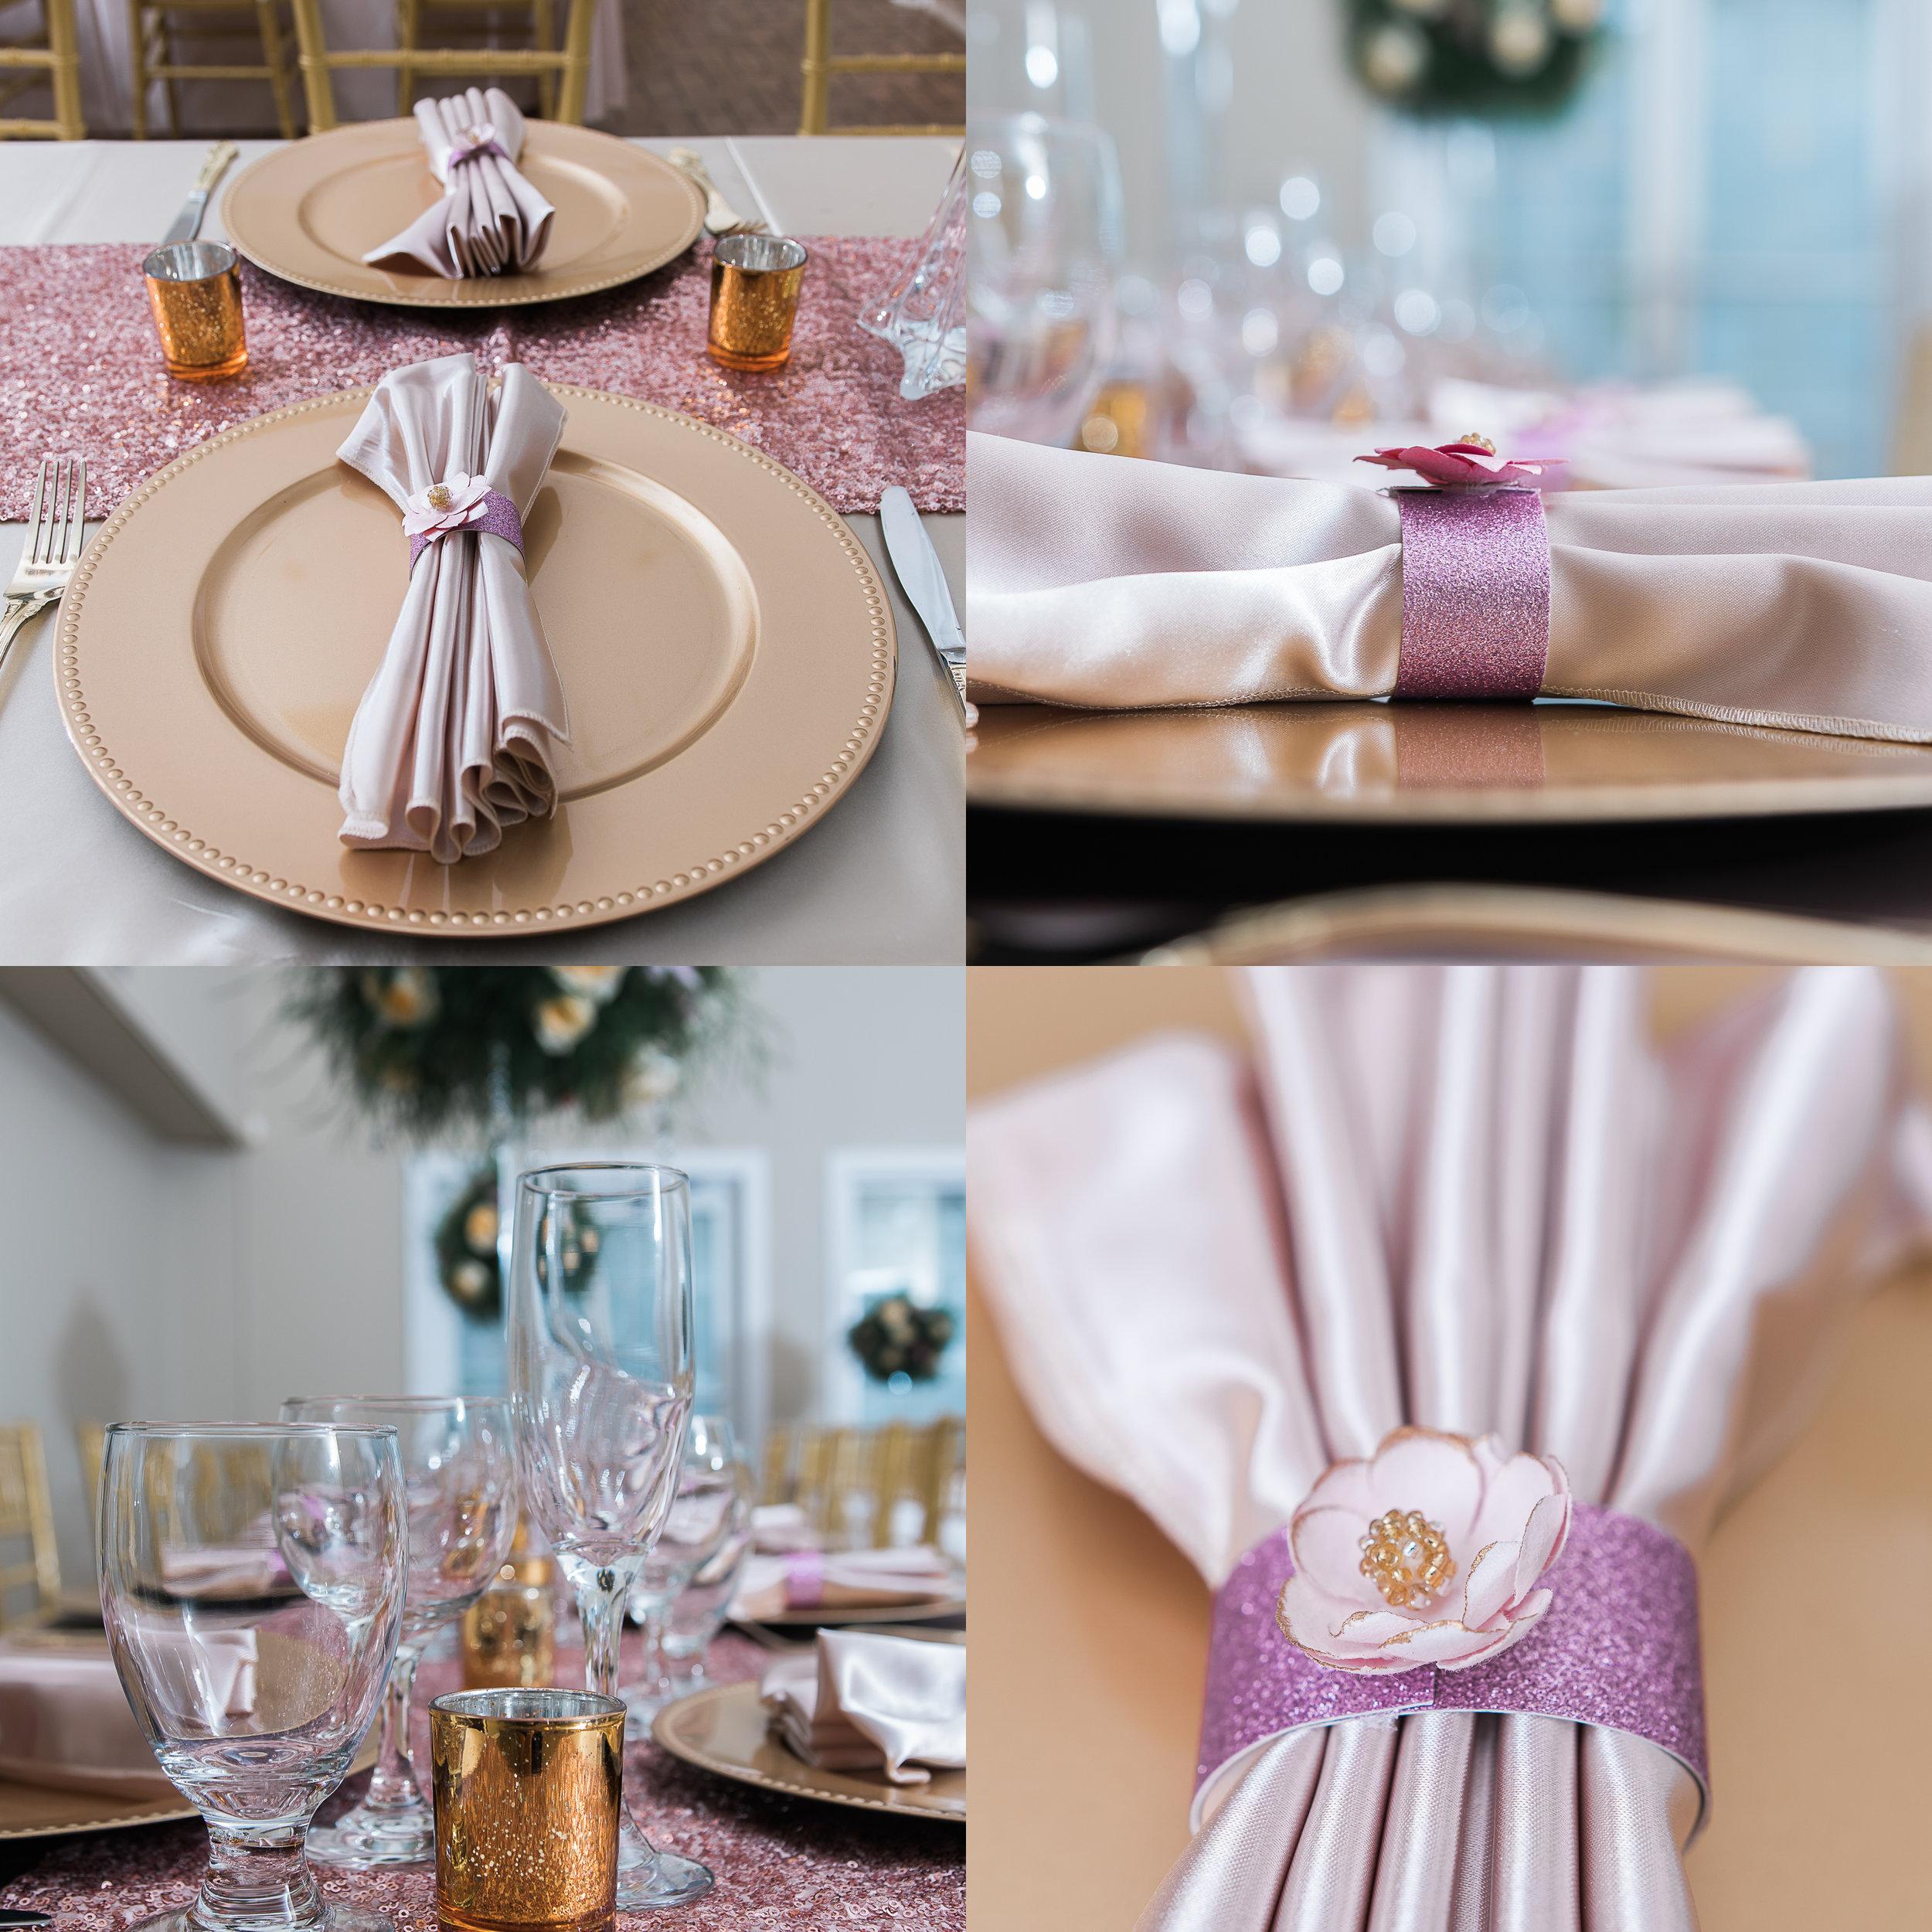 Bok-Tower-gardens-wedding-photography, Tampa-wedding-photography, Florida-wedding-photographer, wedding-details-golden-pink